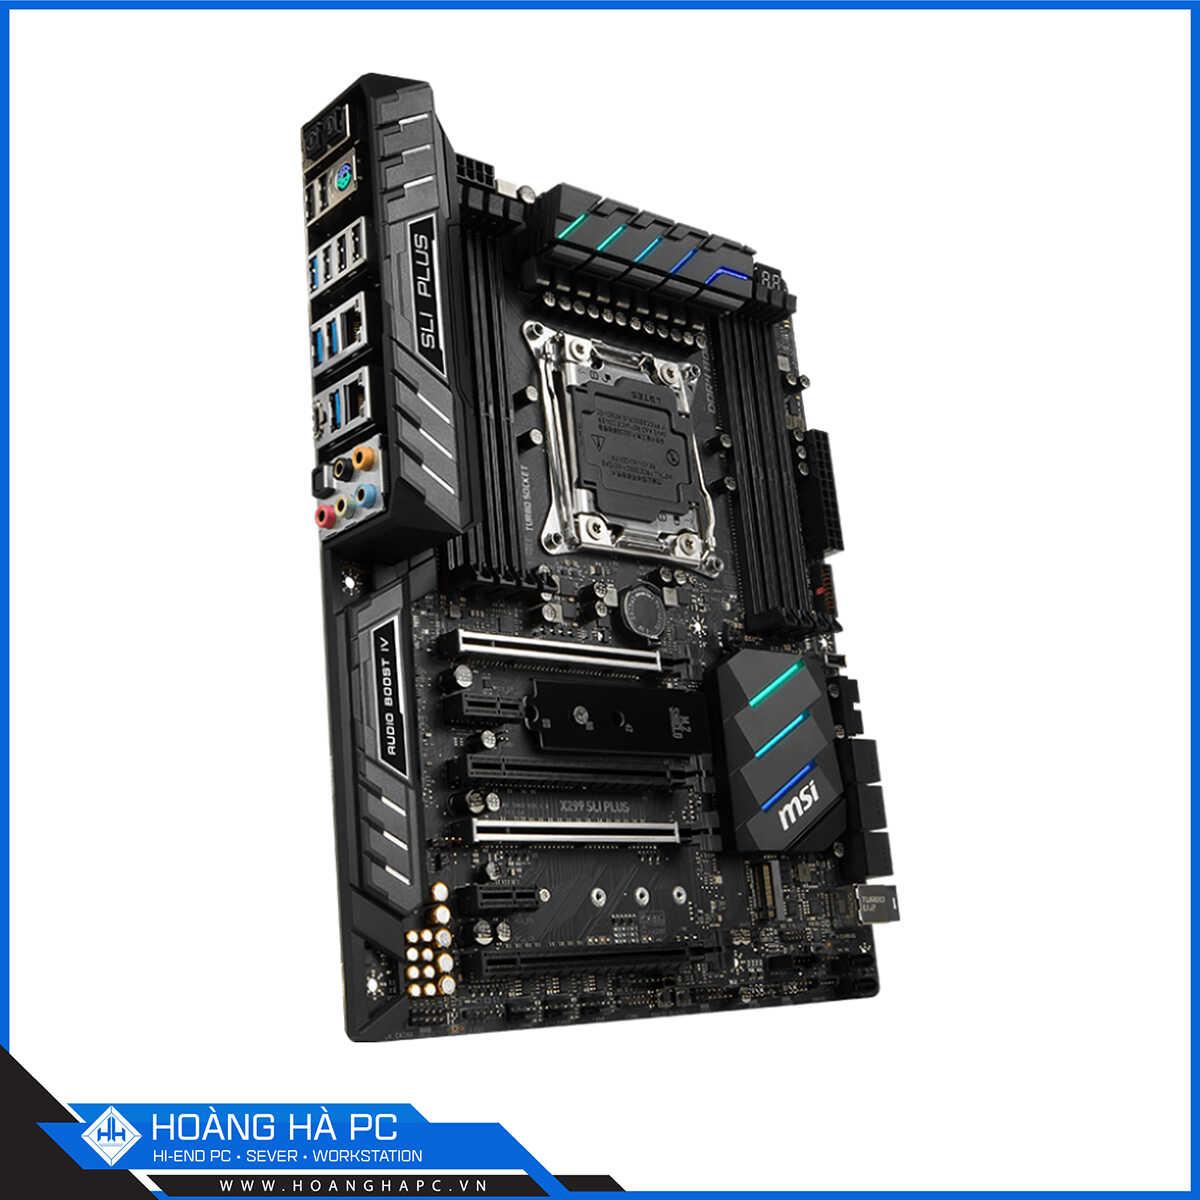 Mainboard Msi X299 Sli Plus